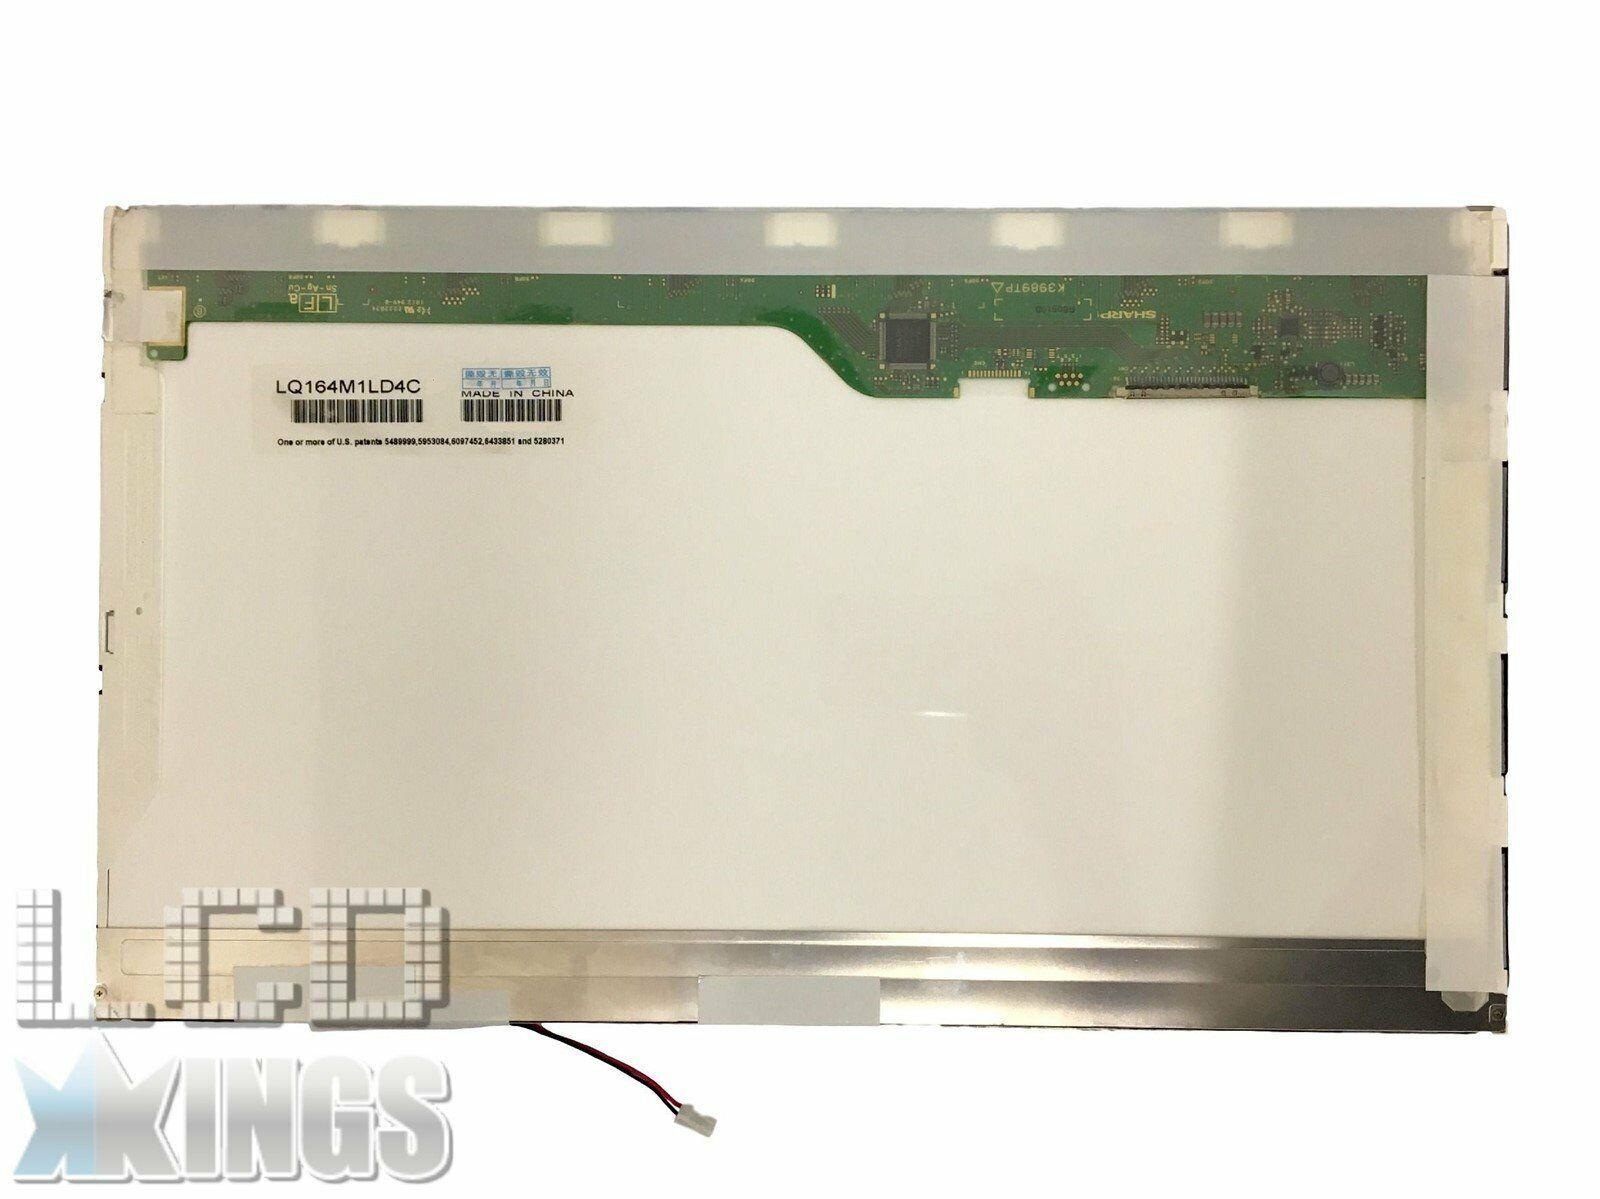 Sharp LQ164M1LD4C 16.4